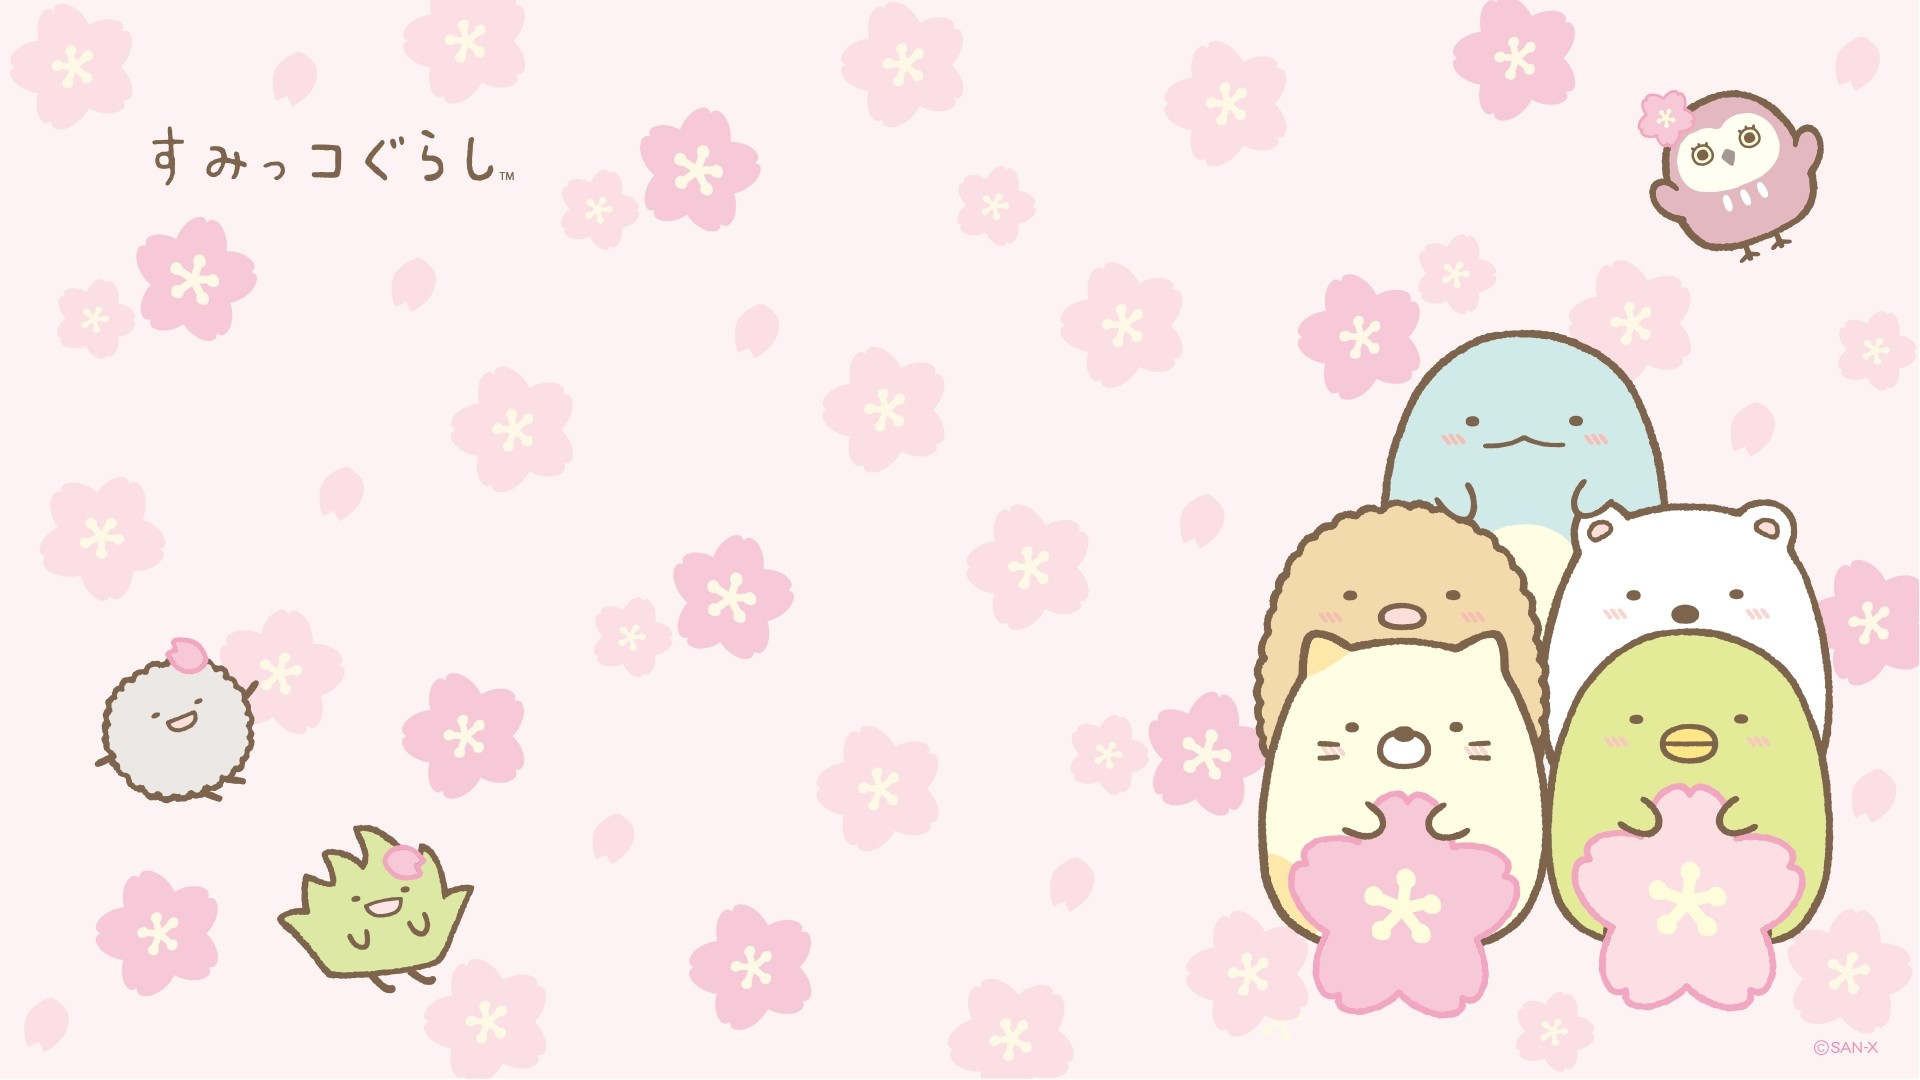 Kawaii Wallpaper Picture hd